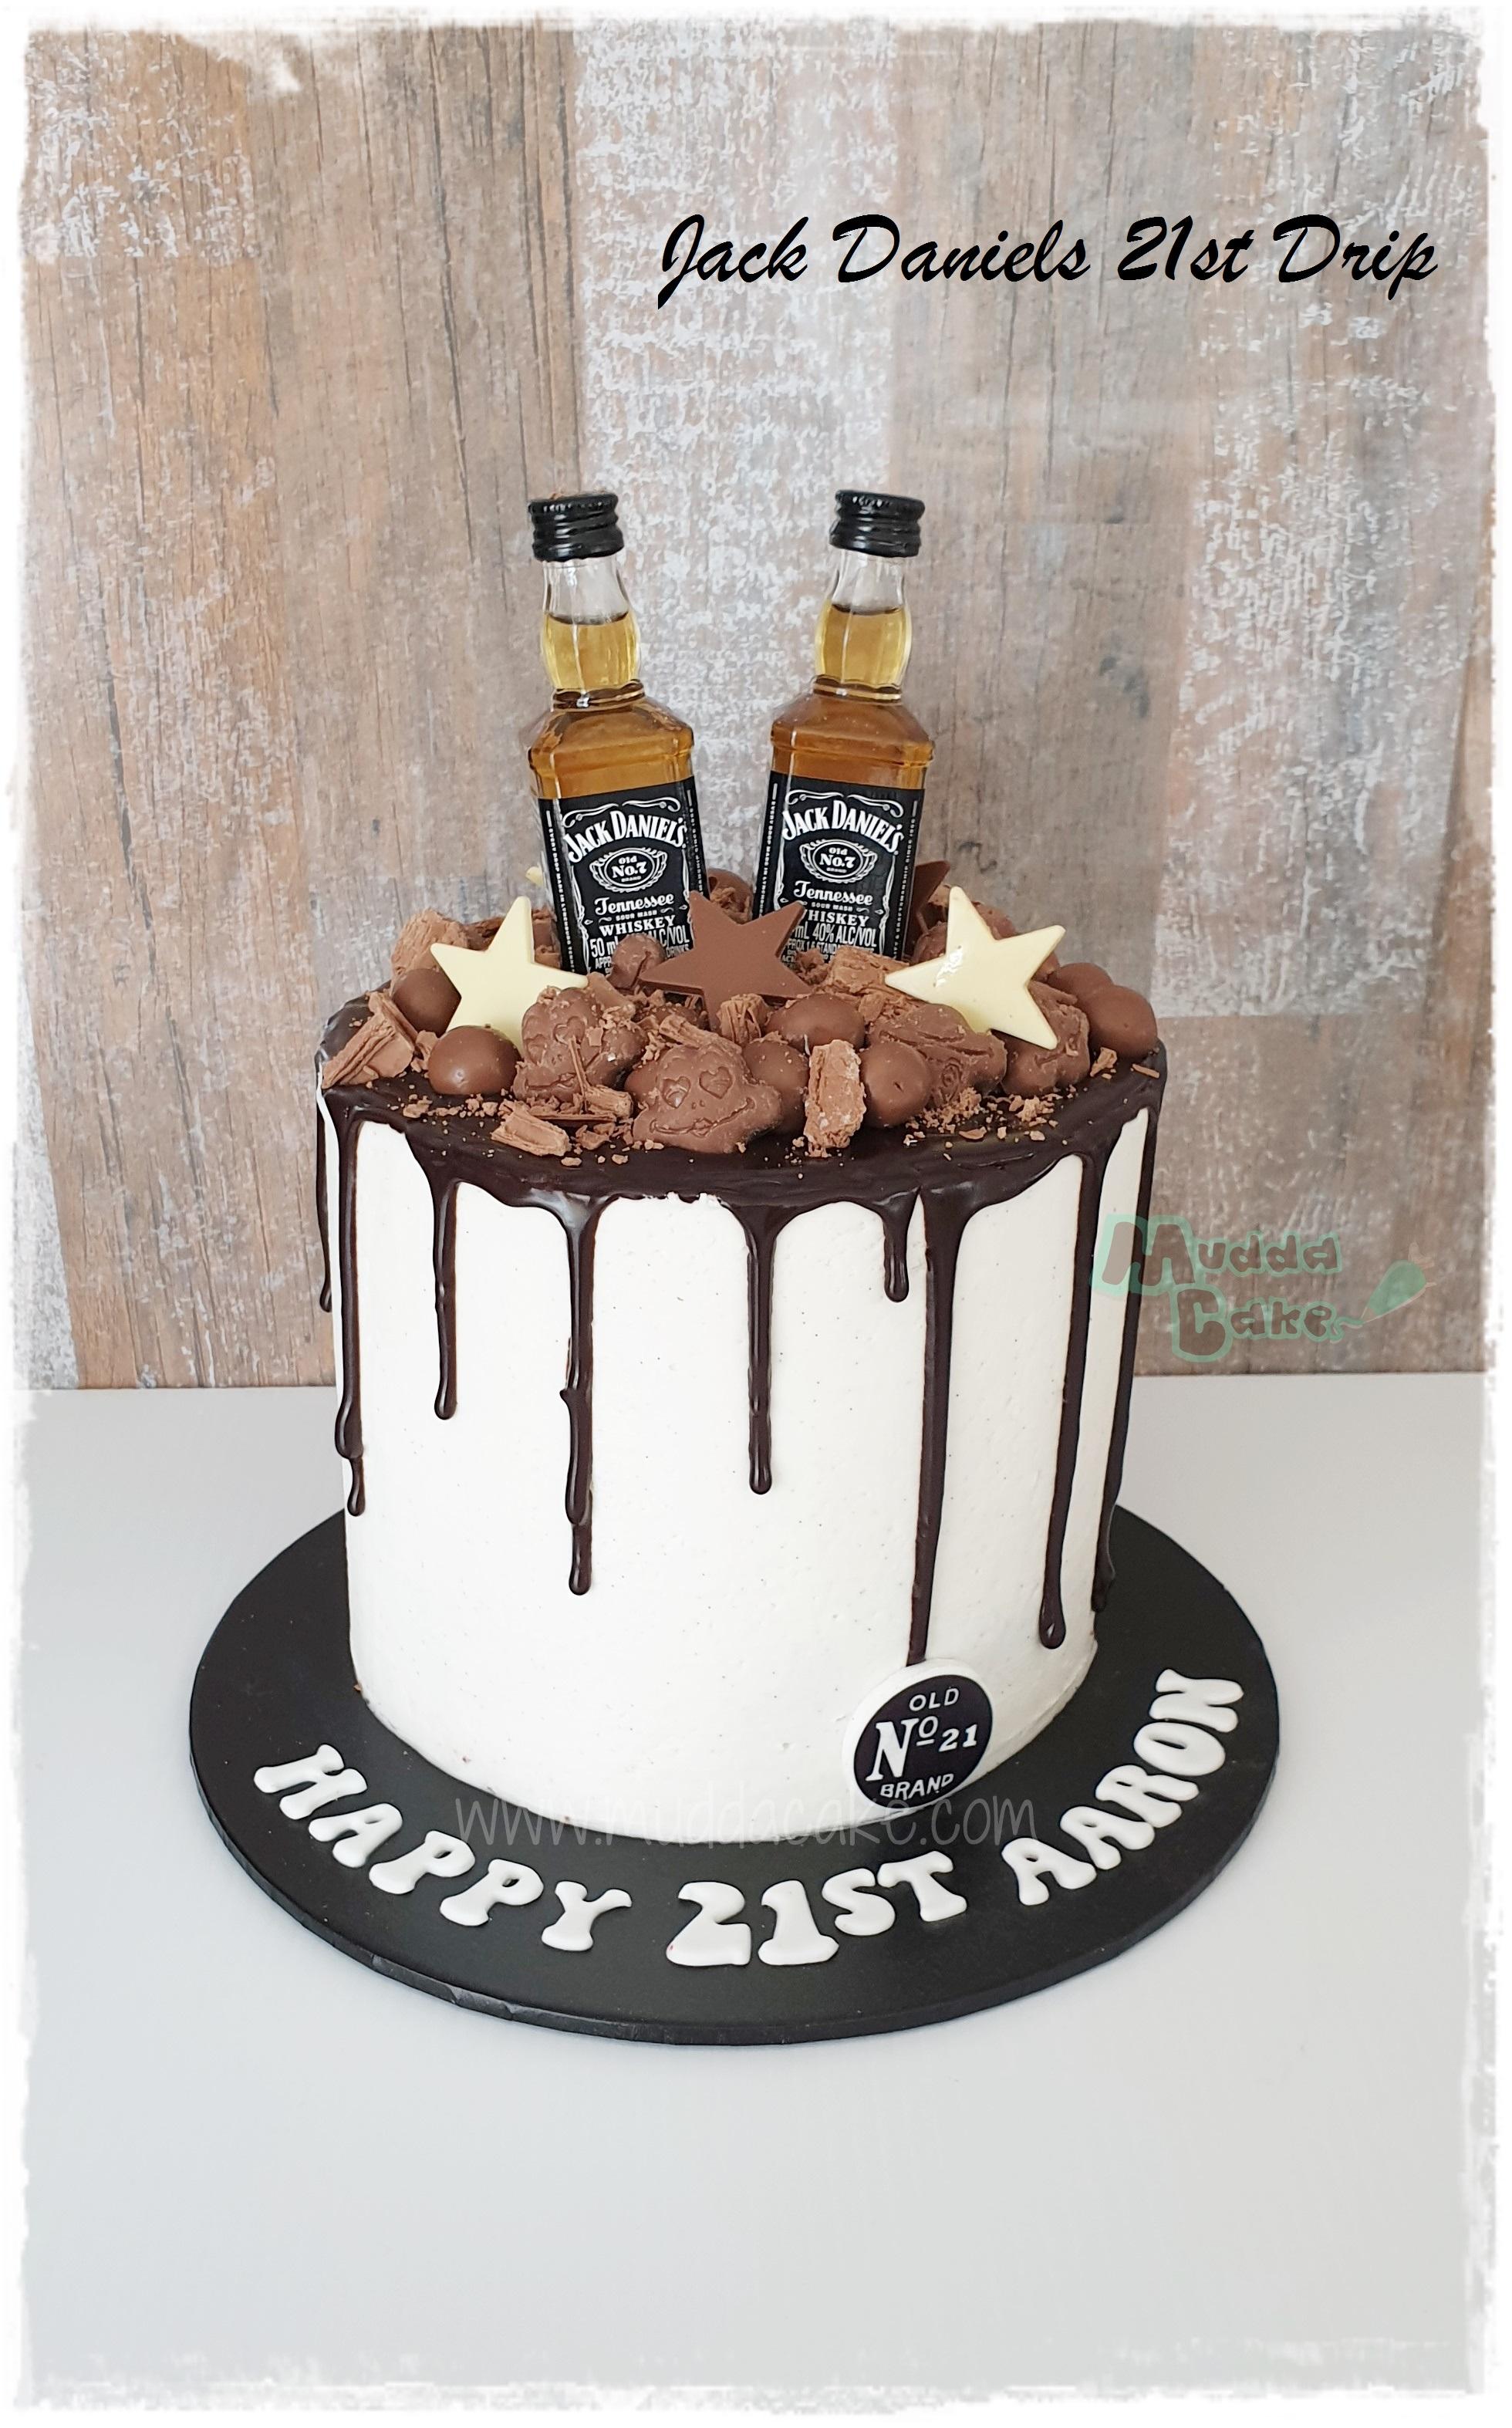 Birthday Cakes Buff Point Central Coast Mudda Cake